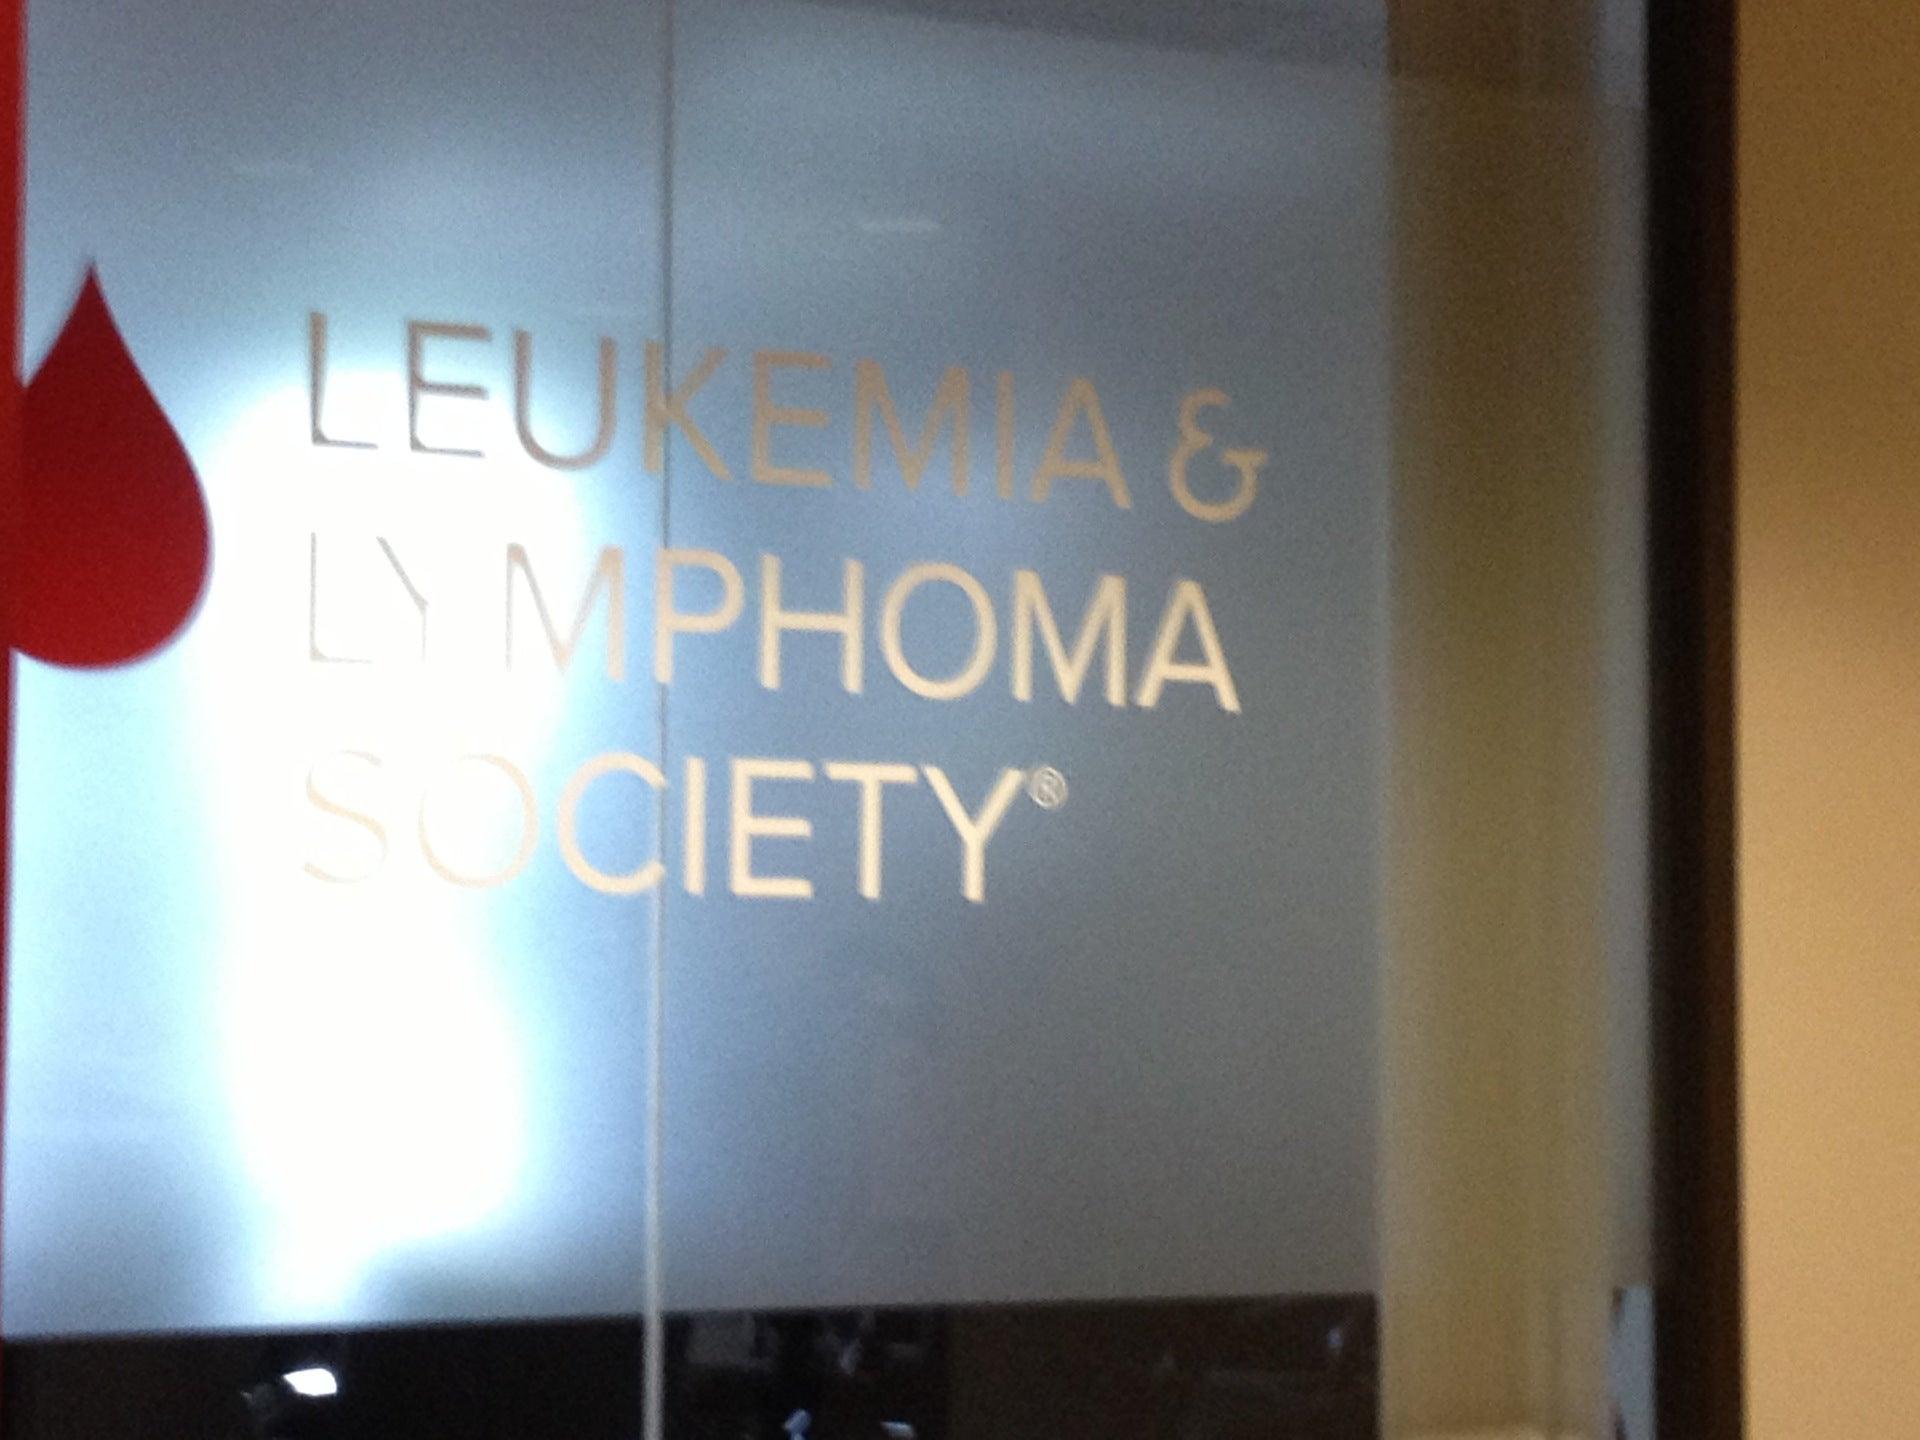 Leukemia & Lymphoma Society,non-profit organization